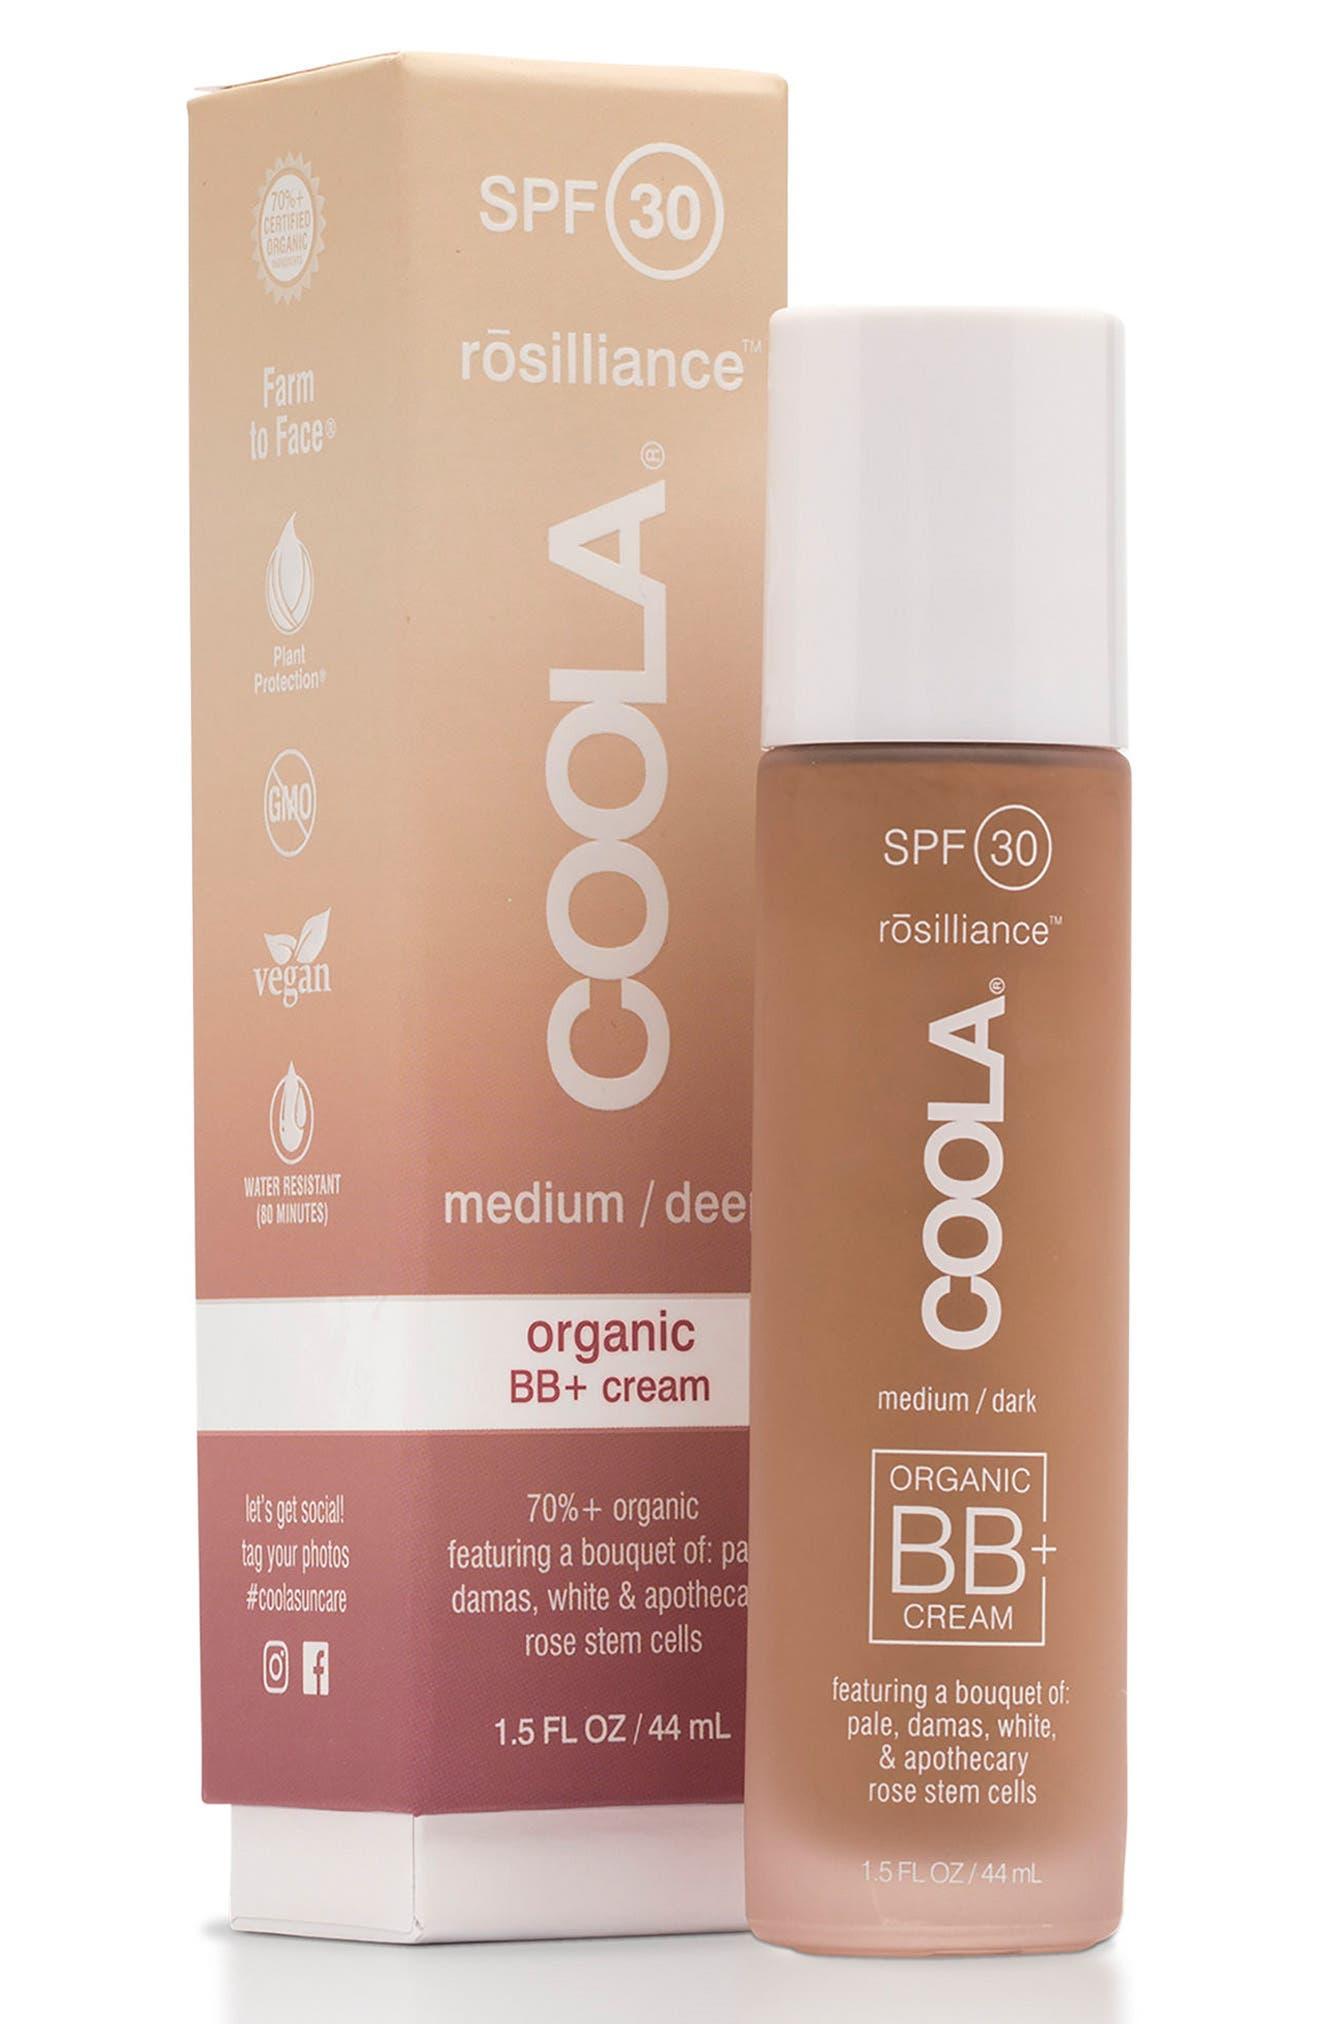 COOLA<sup>®</sup> Suncare rosilliance<sup>™</sup> Mineral BB+ Cream SPF 30,                             Main thumbnail 1, color,                             MEDIUM DARK